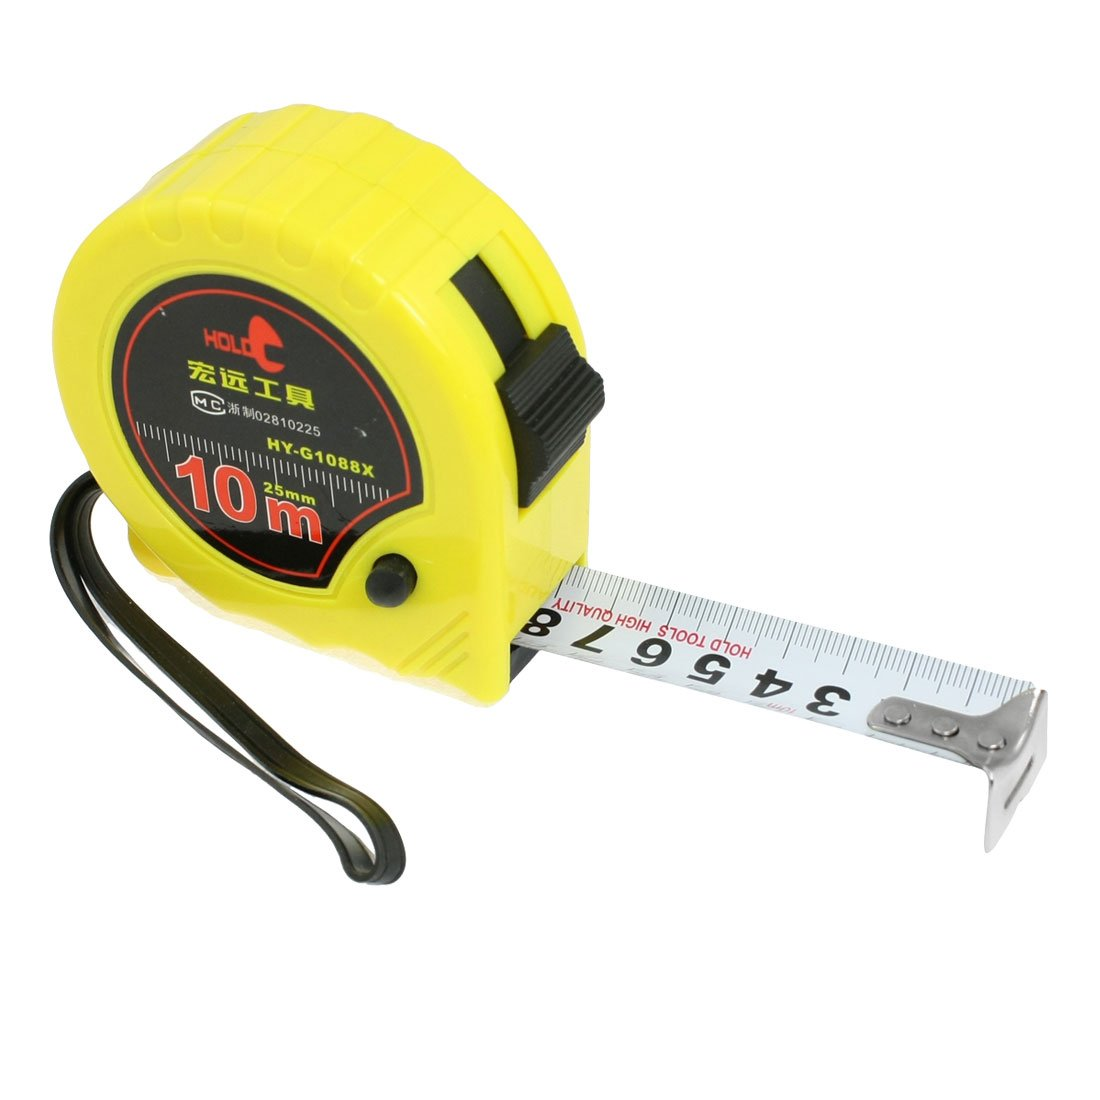 self retract flexible metric tape measure measuring tools 10m x 1